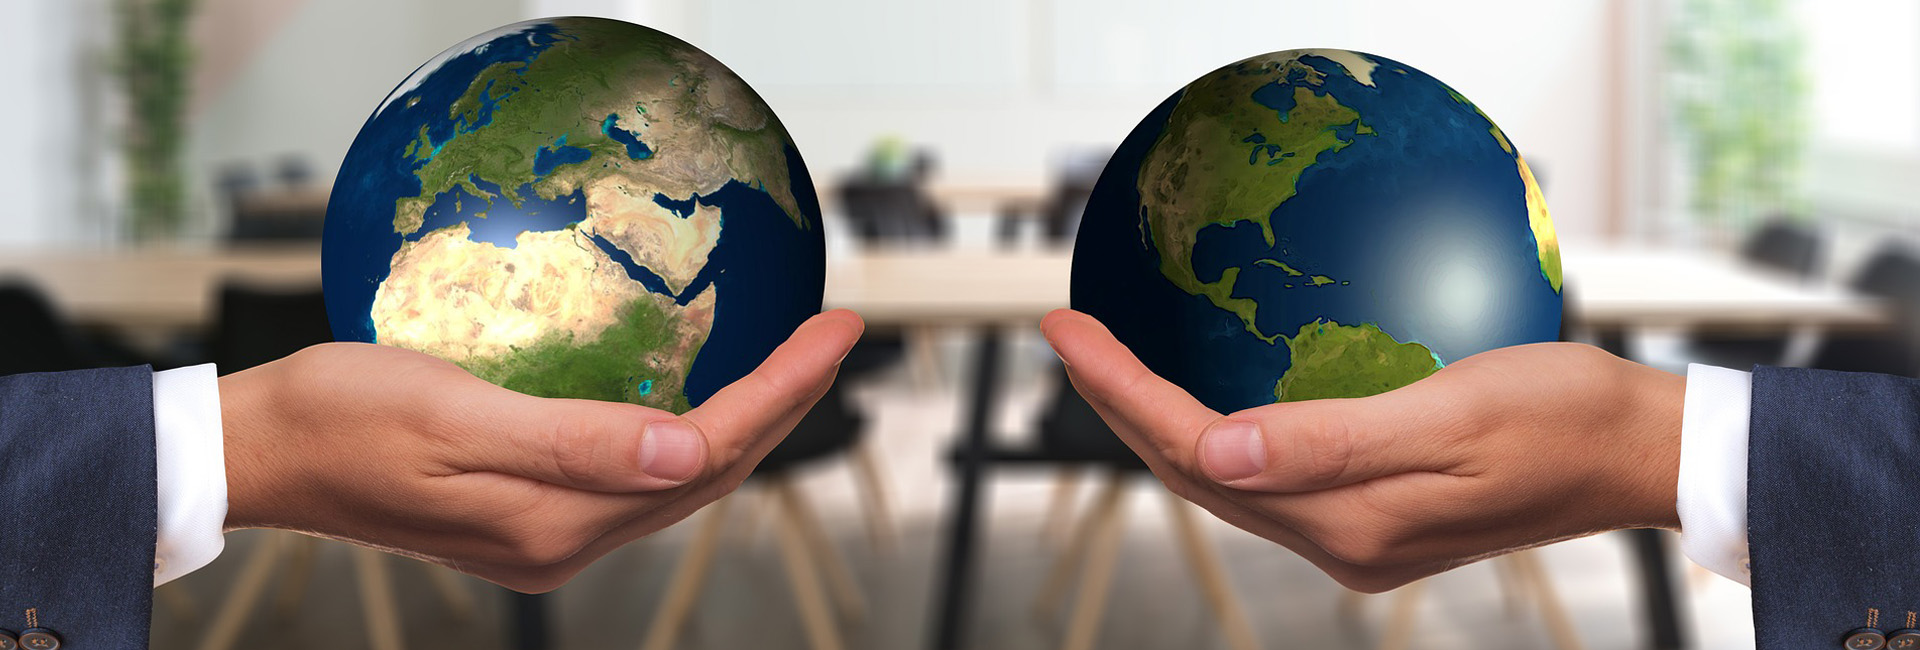 Erasmus+ Partner Countries